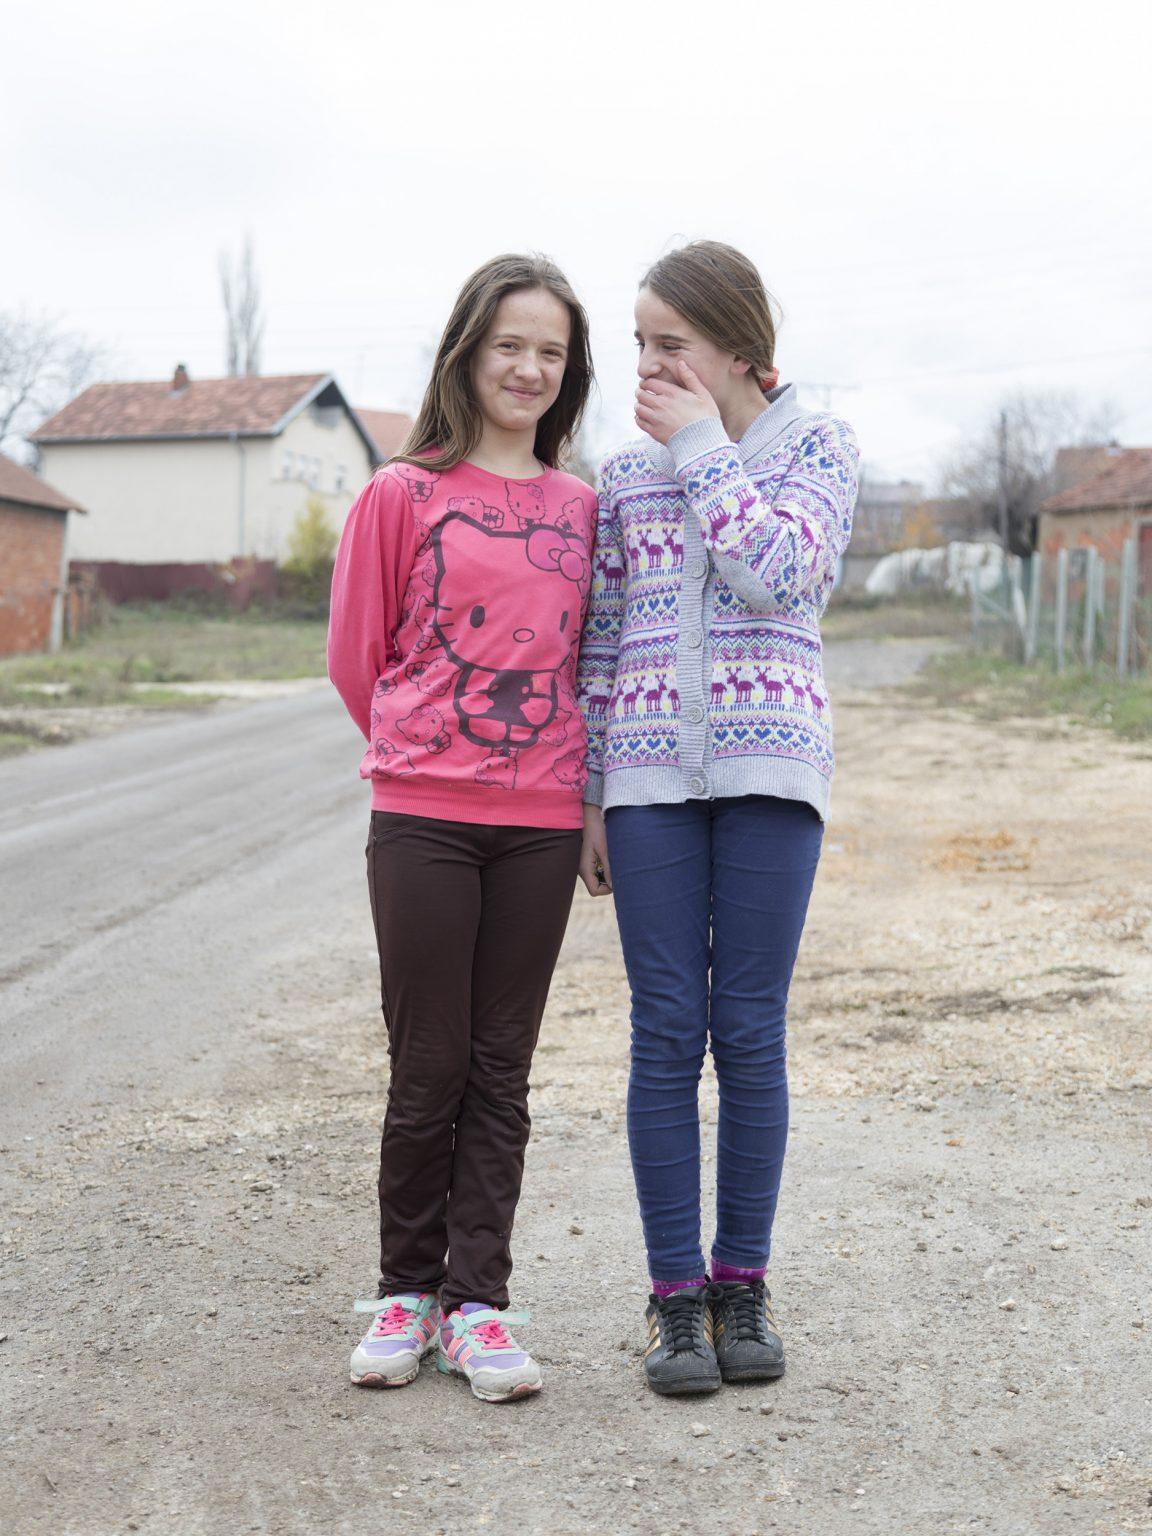 Bardha Januzi, 12, and Yilza Pllana, 10 in the town of Lajthishte/Leskovcic